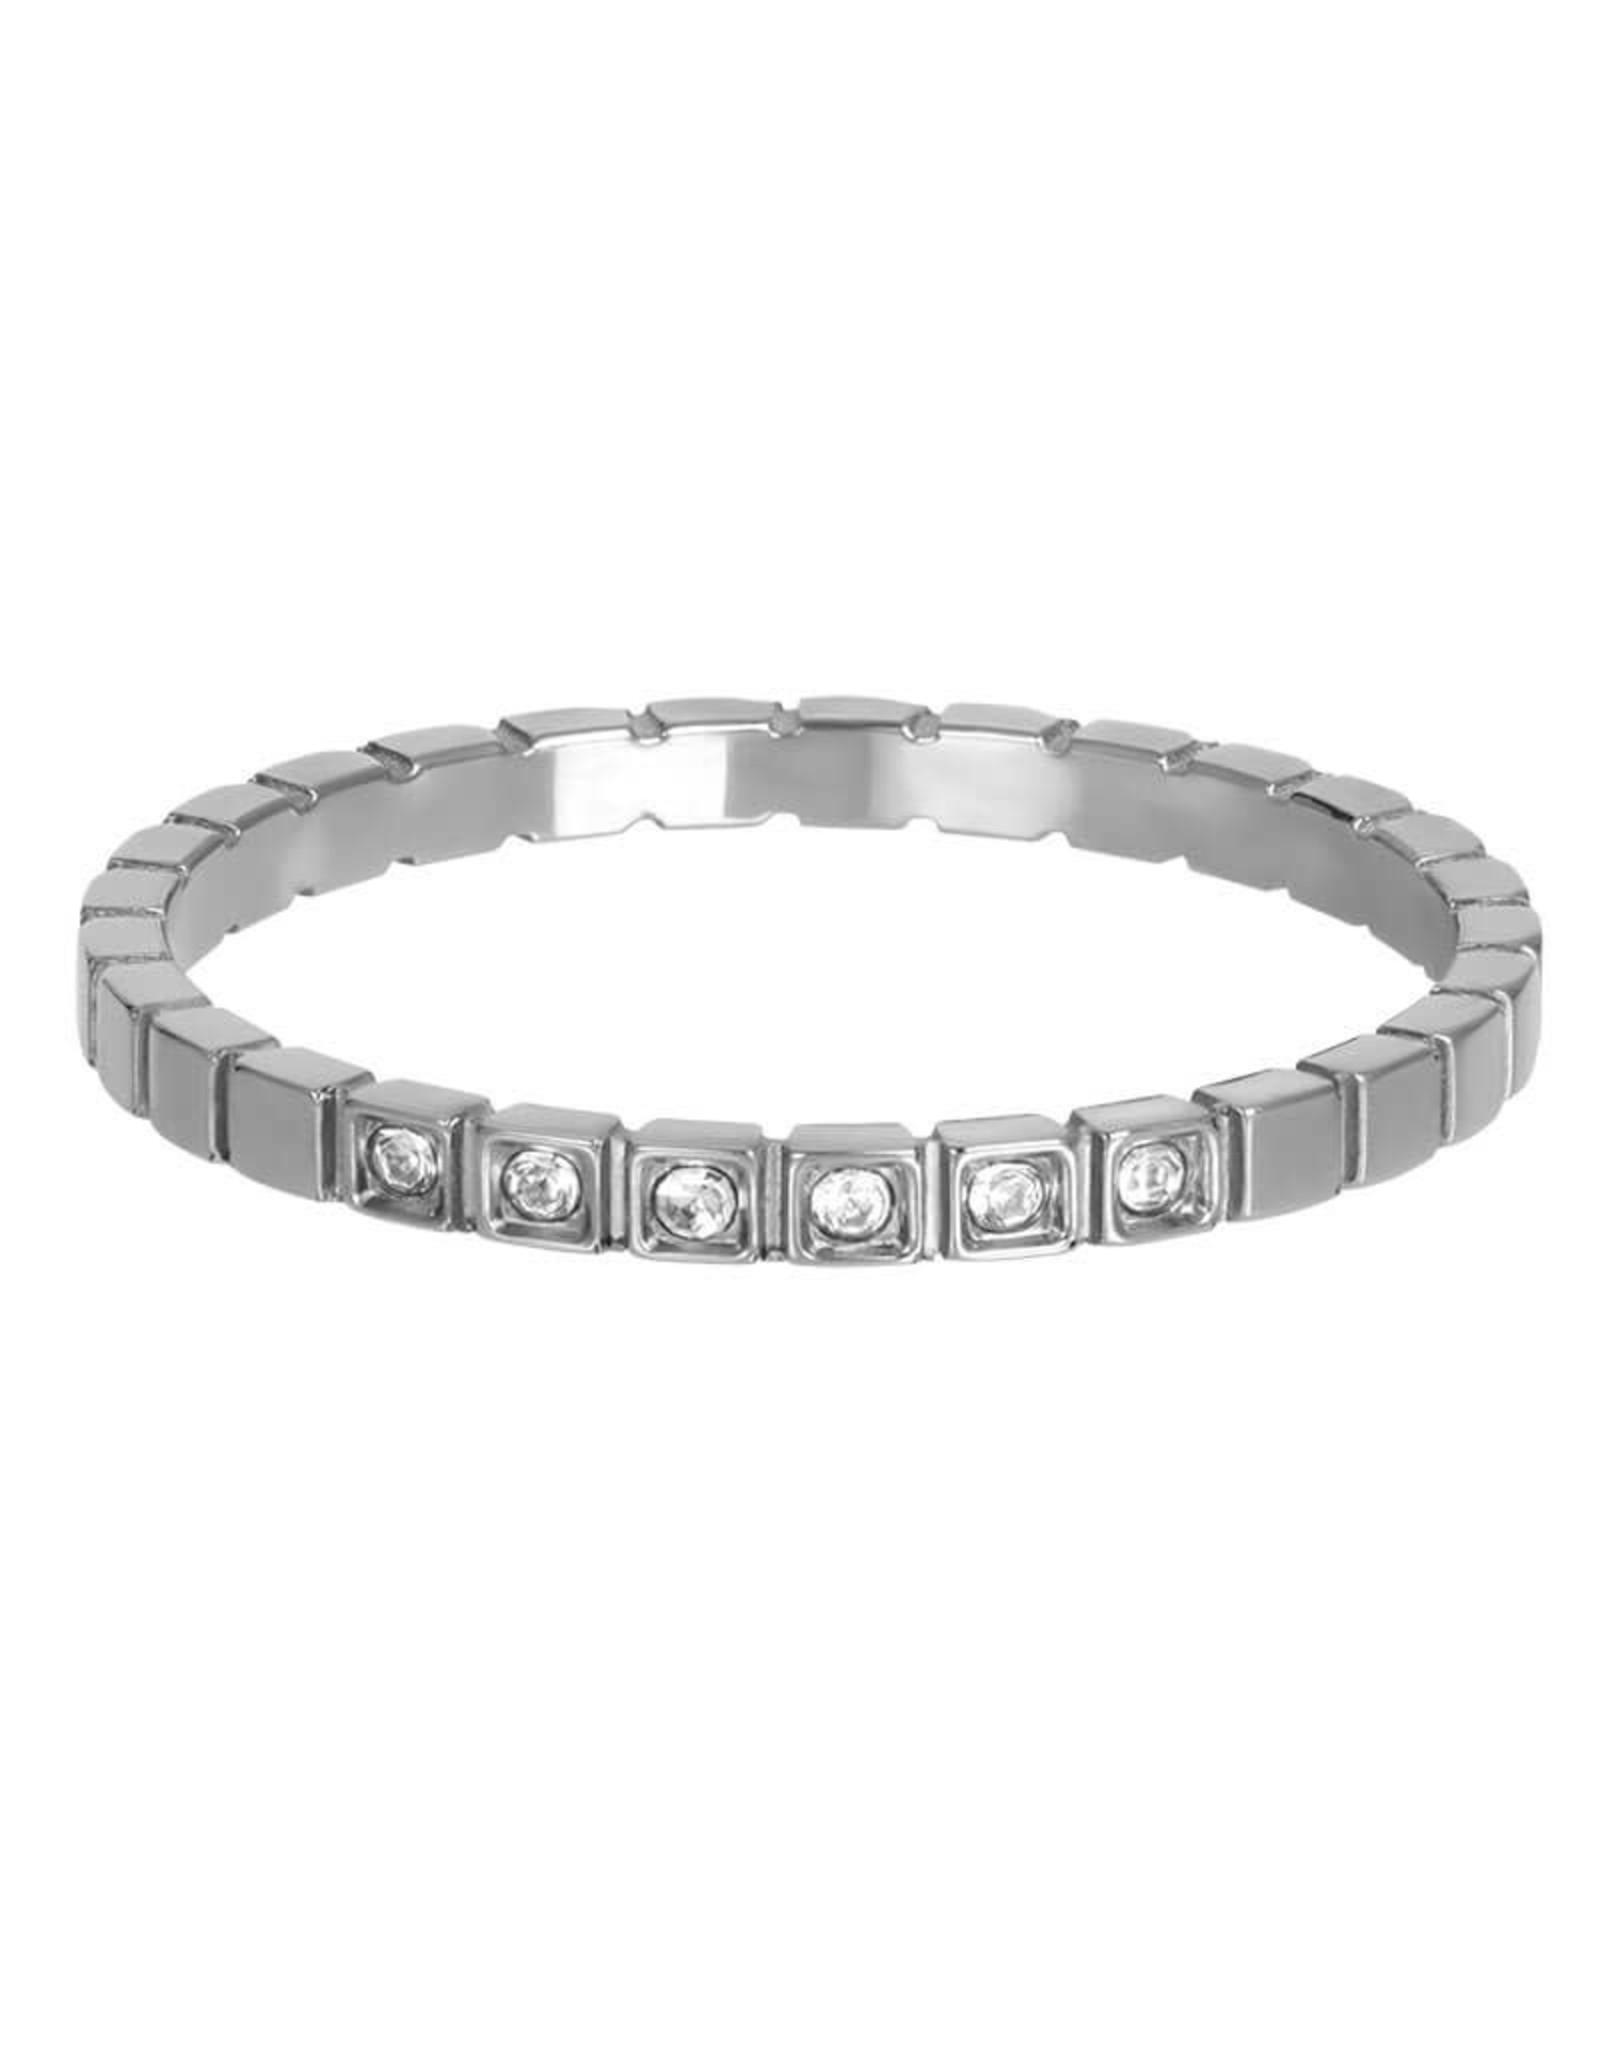 IXXXI IXXXI Palace Ring Silver